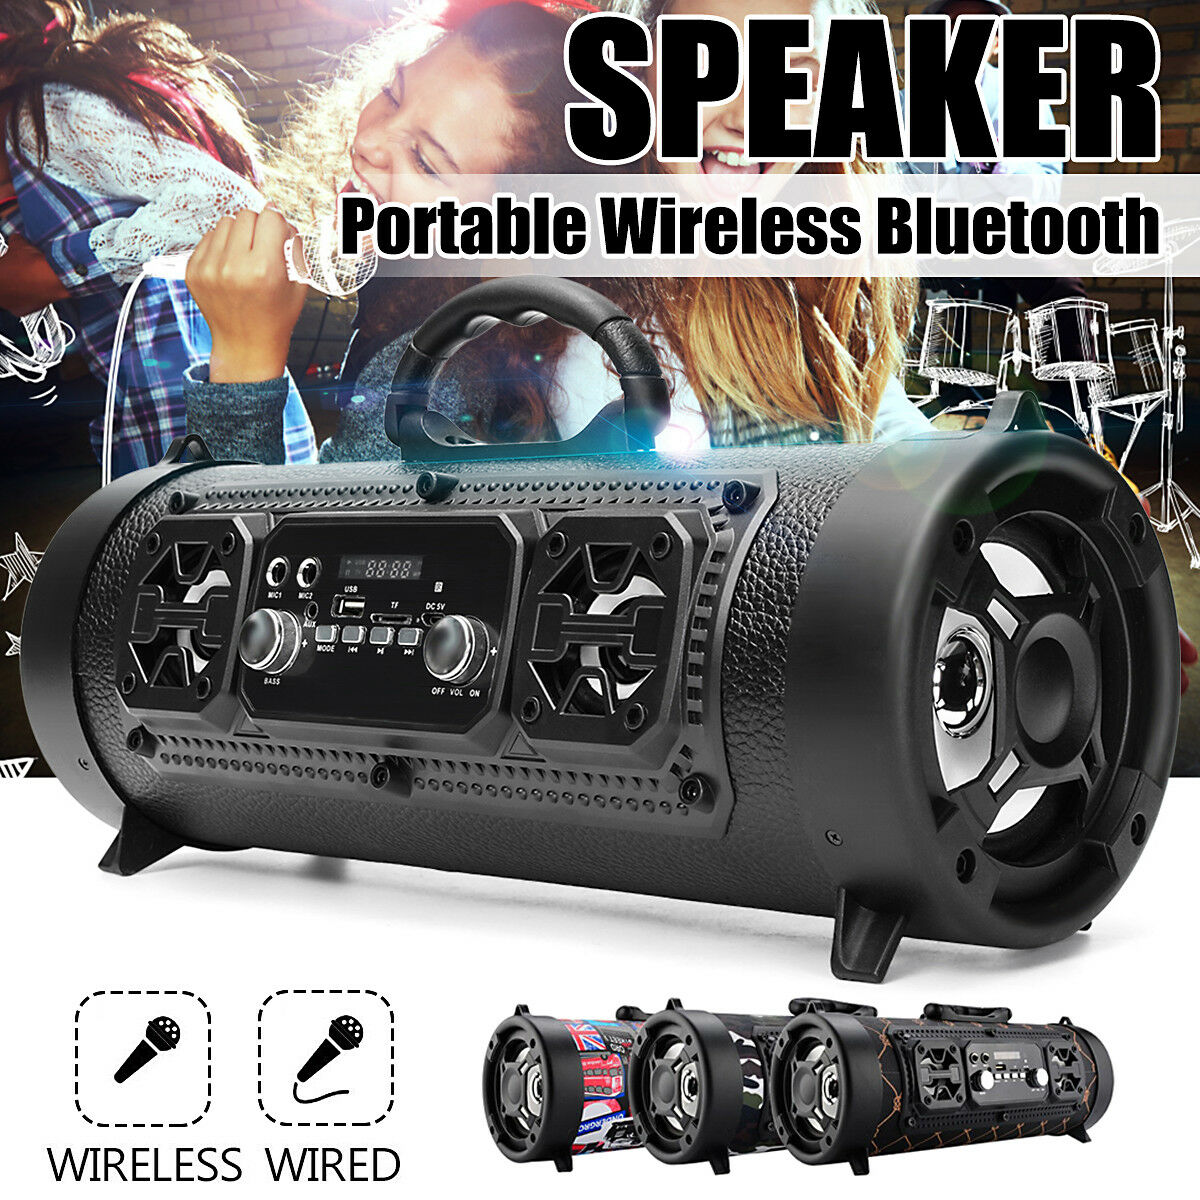 Portable Wireless Bluetooth Speaker FM Bass Stereo Radio HIFI Xmas Party Music